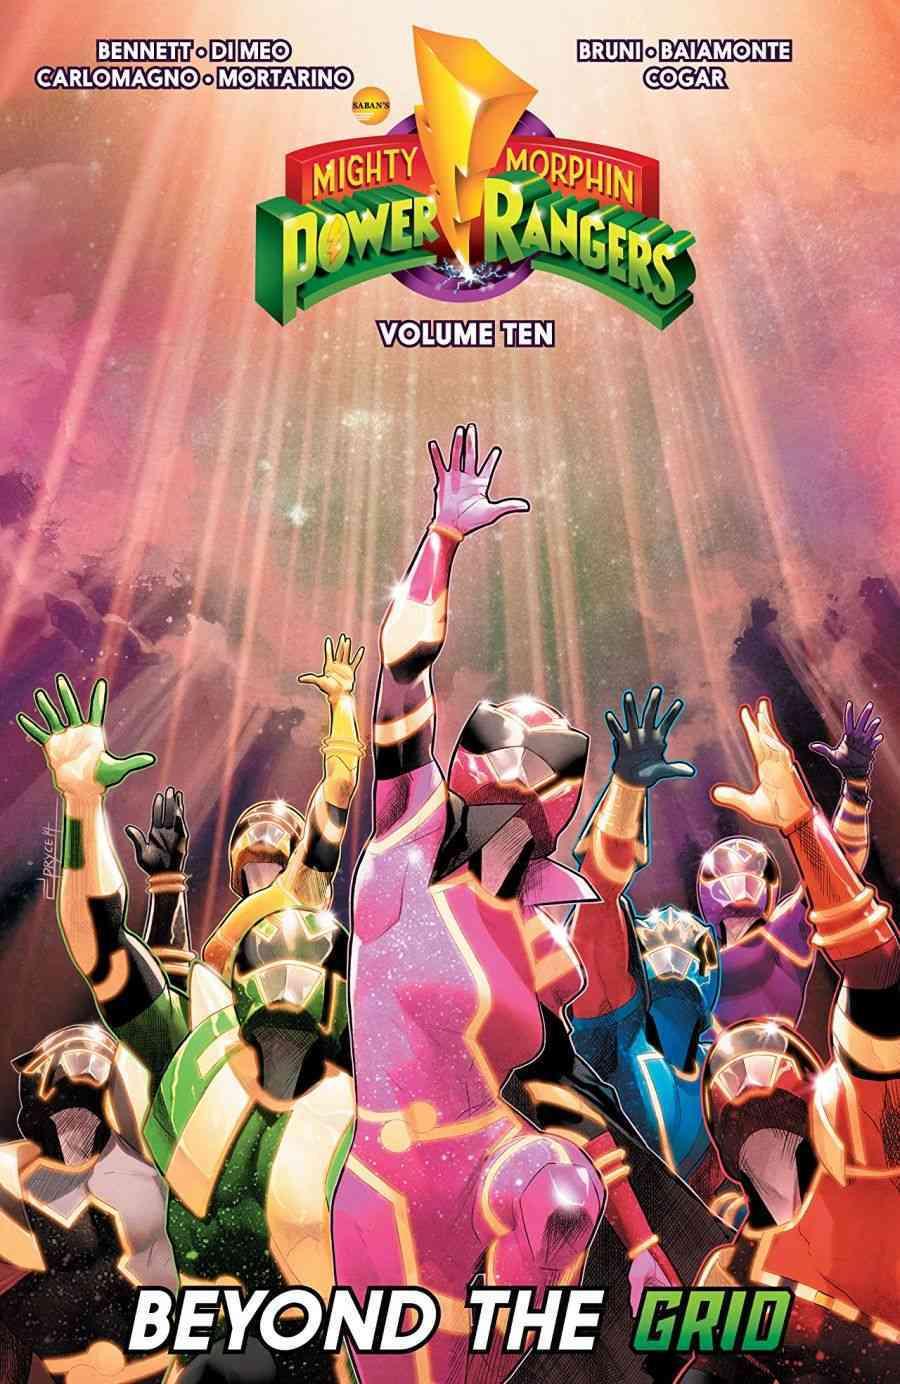 Poderoso Morphin Power Rangers Vol. 10 Além da grade